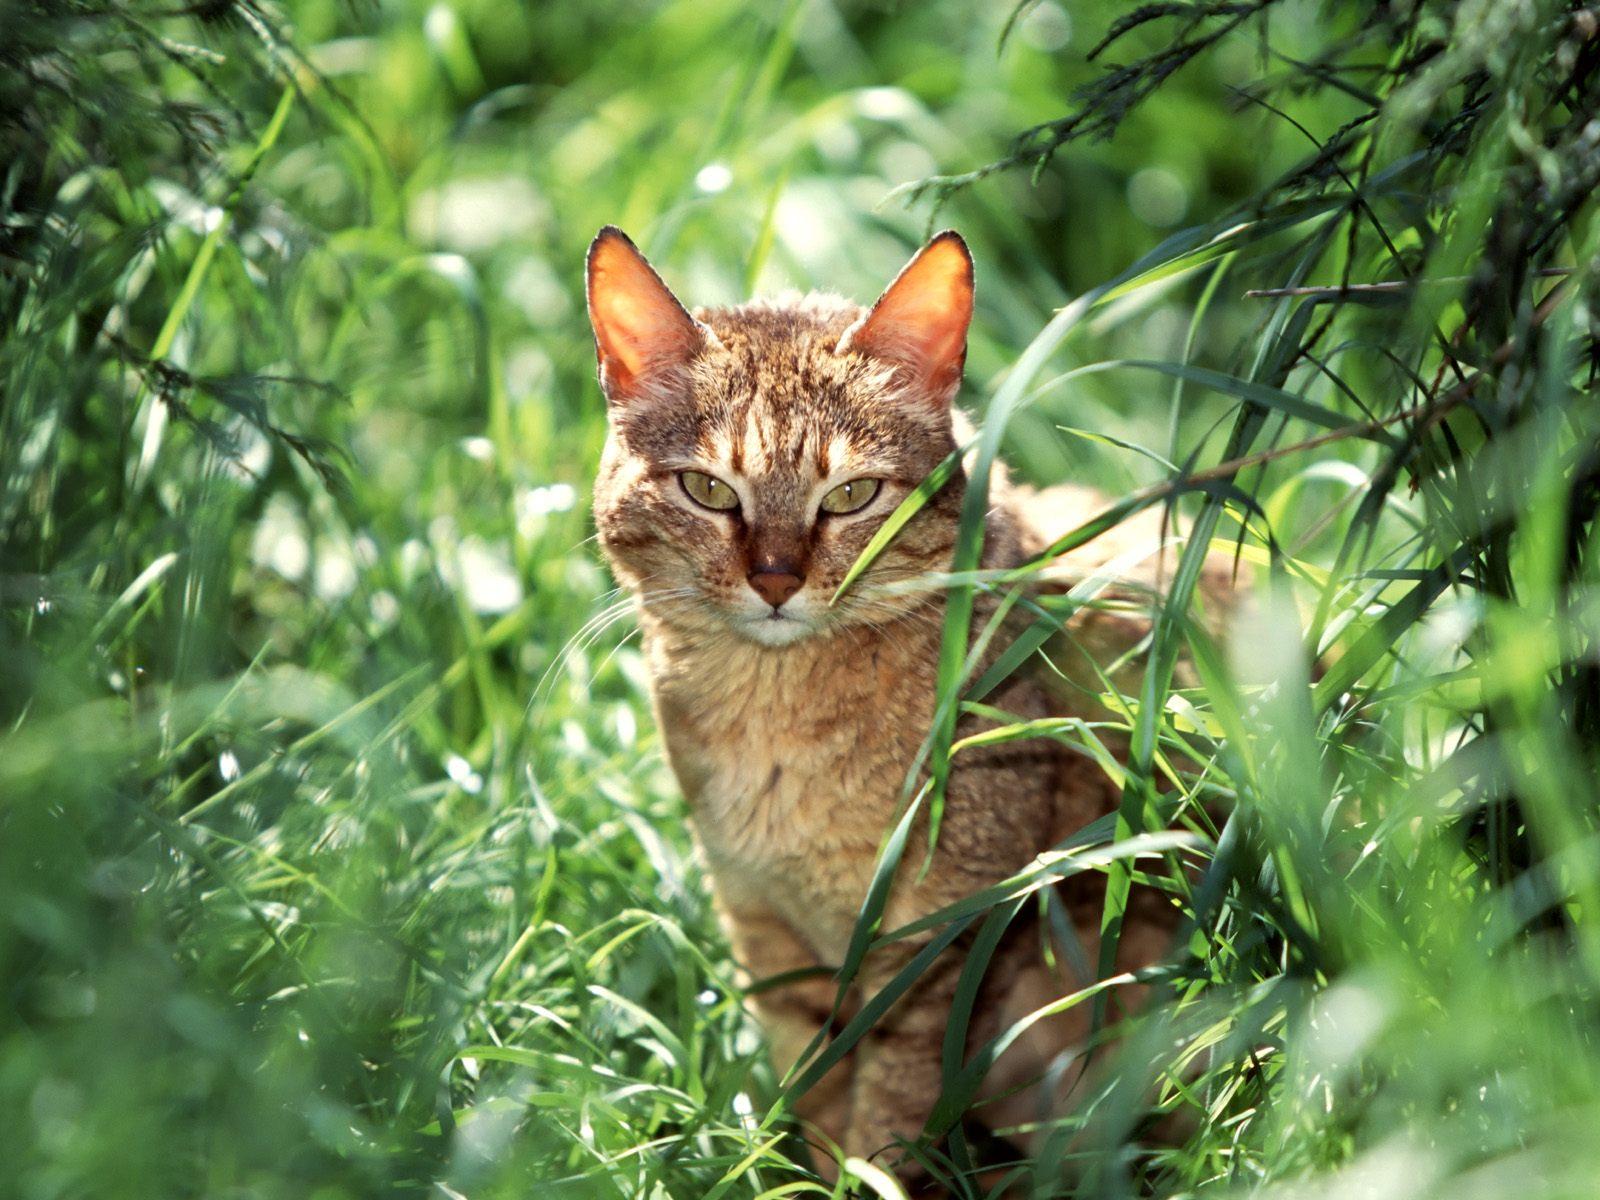 Warrior Cats Wallpaper With Quotes Download Free Warrior Cats Backgrounds Pixelstalk Net